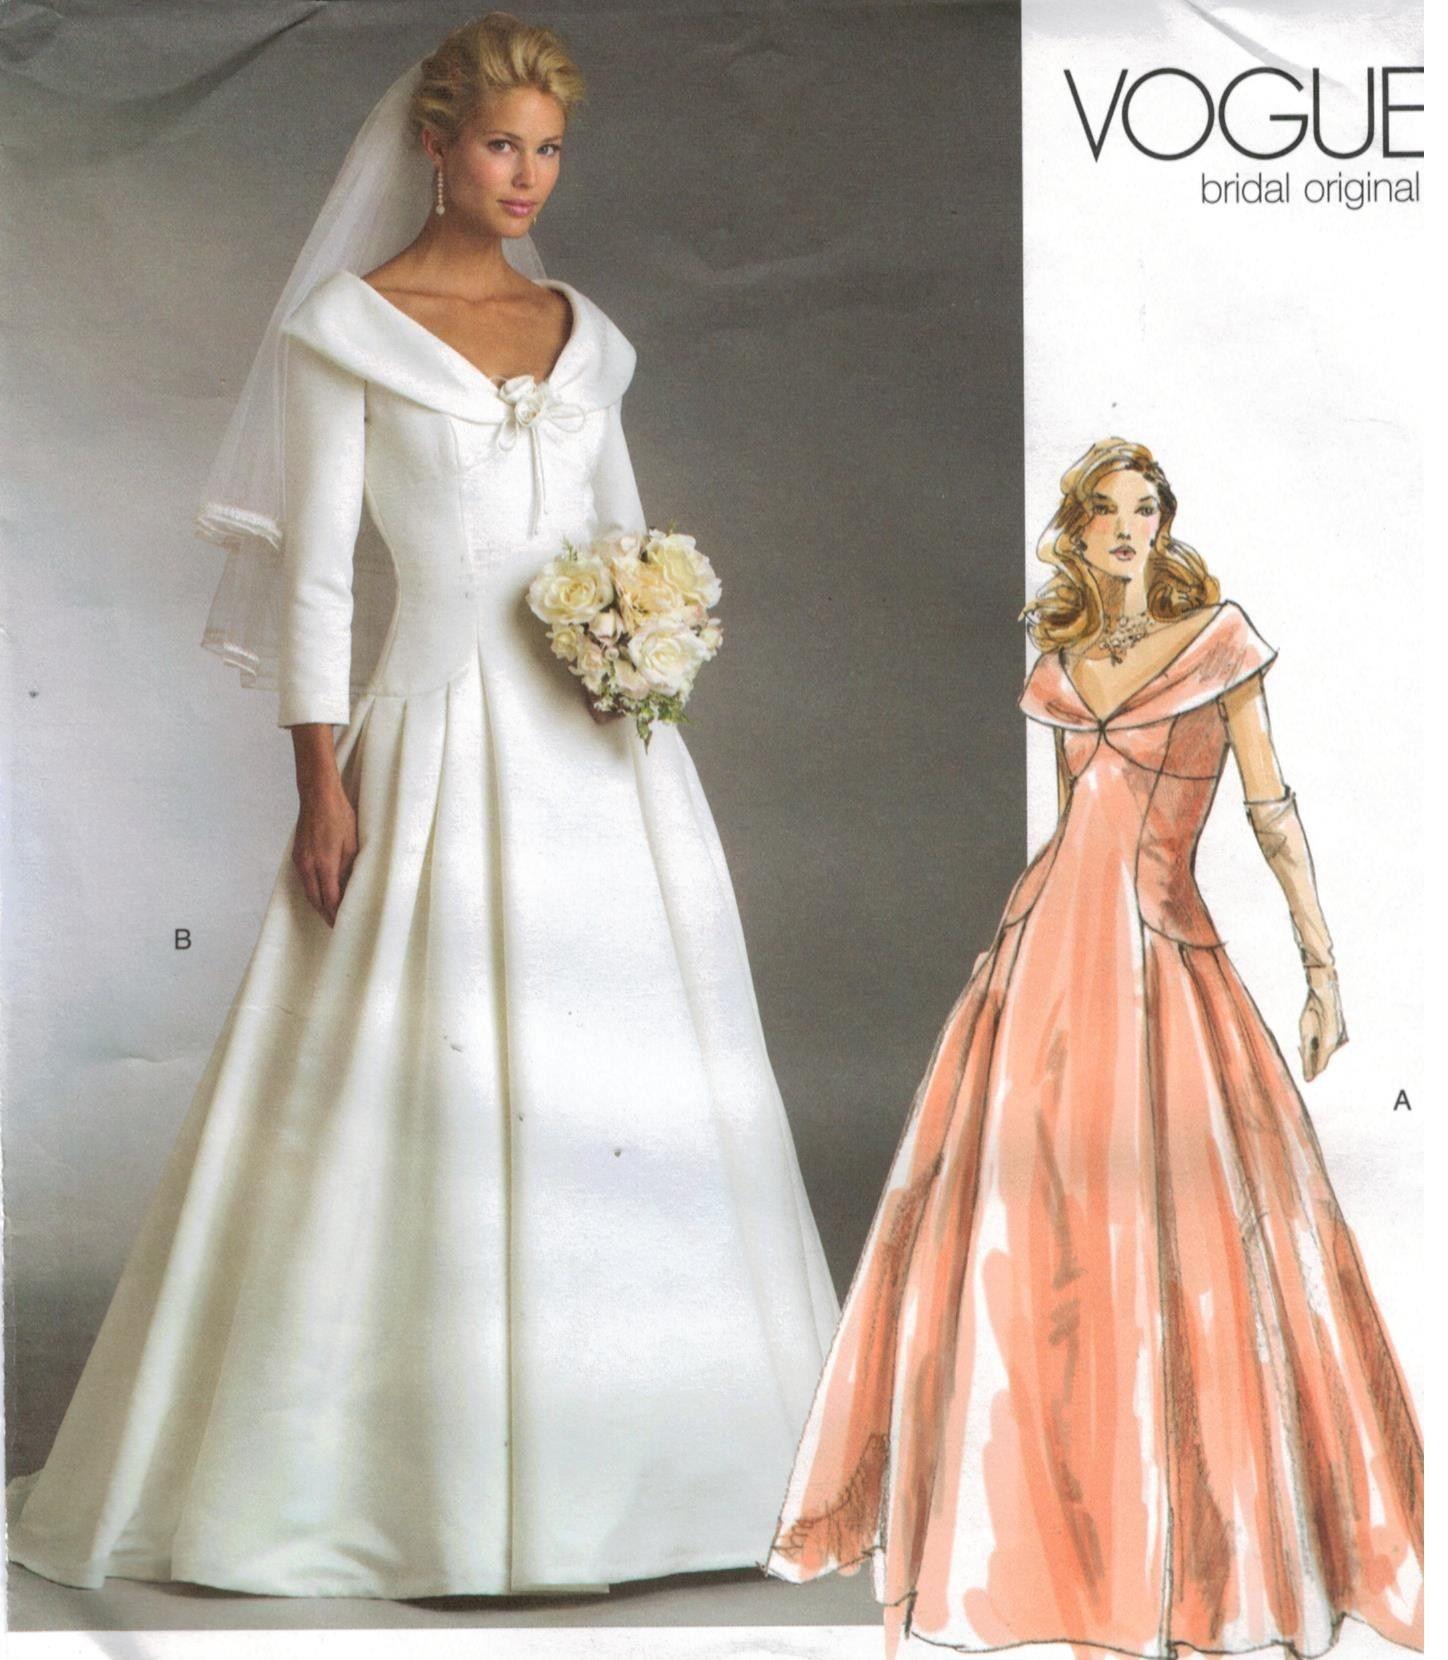 53 Awesome Mermaid Wedding Dress Sewing Pattern Pictures Wedding Dress Gall Vogue Wedding Dress Patterns Wedding Dress Sewing Patterns Lace Top Wedding Dress [ 1660 x 1448 Pixel ]